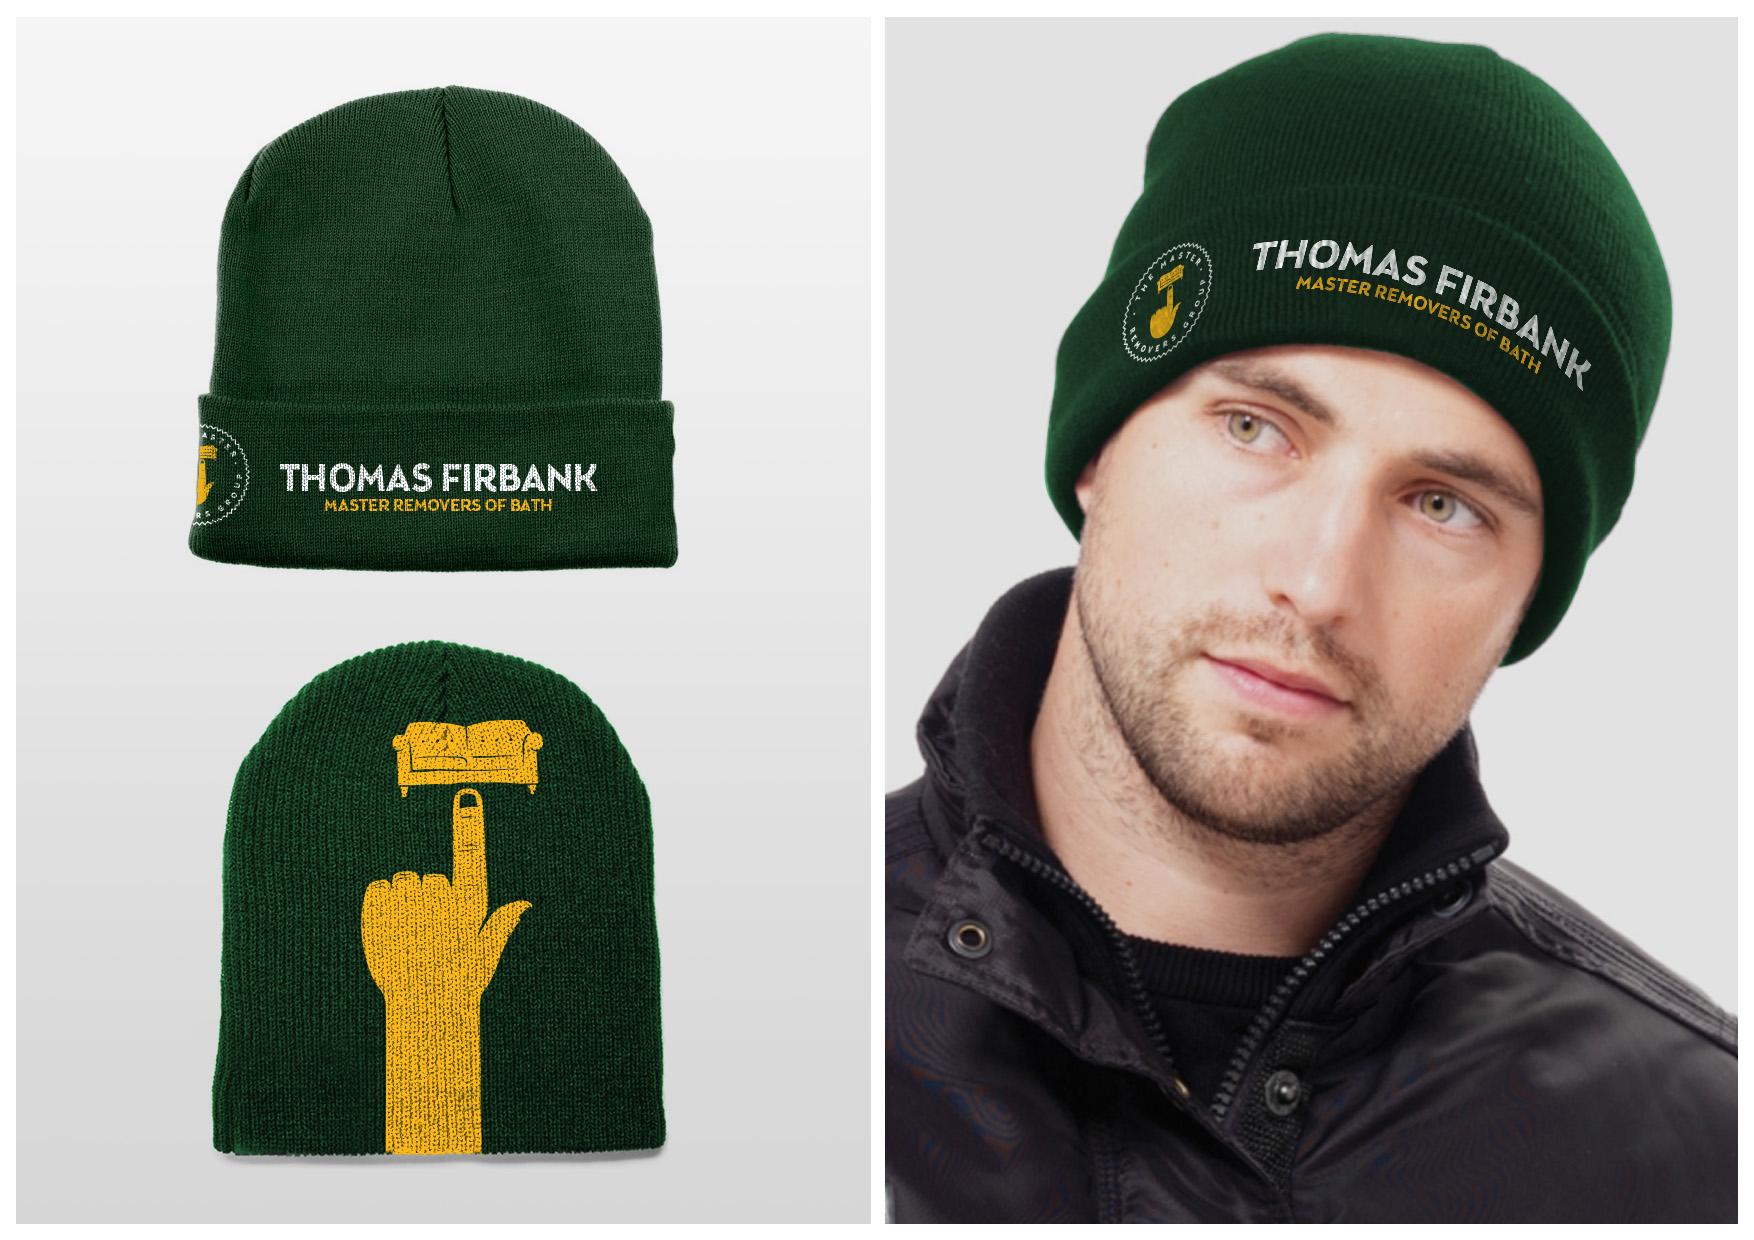 TMRG_ThomasFirbank_Beanie 2.jpg